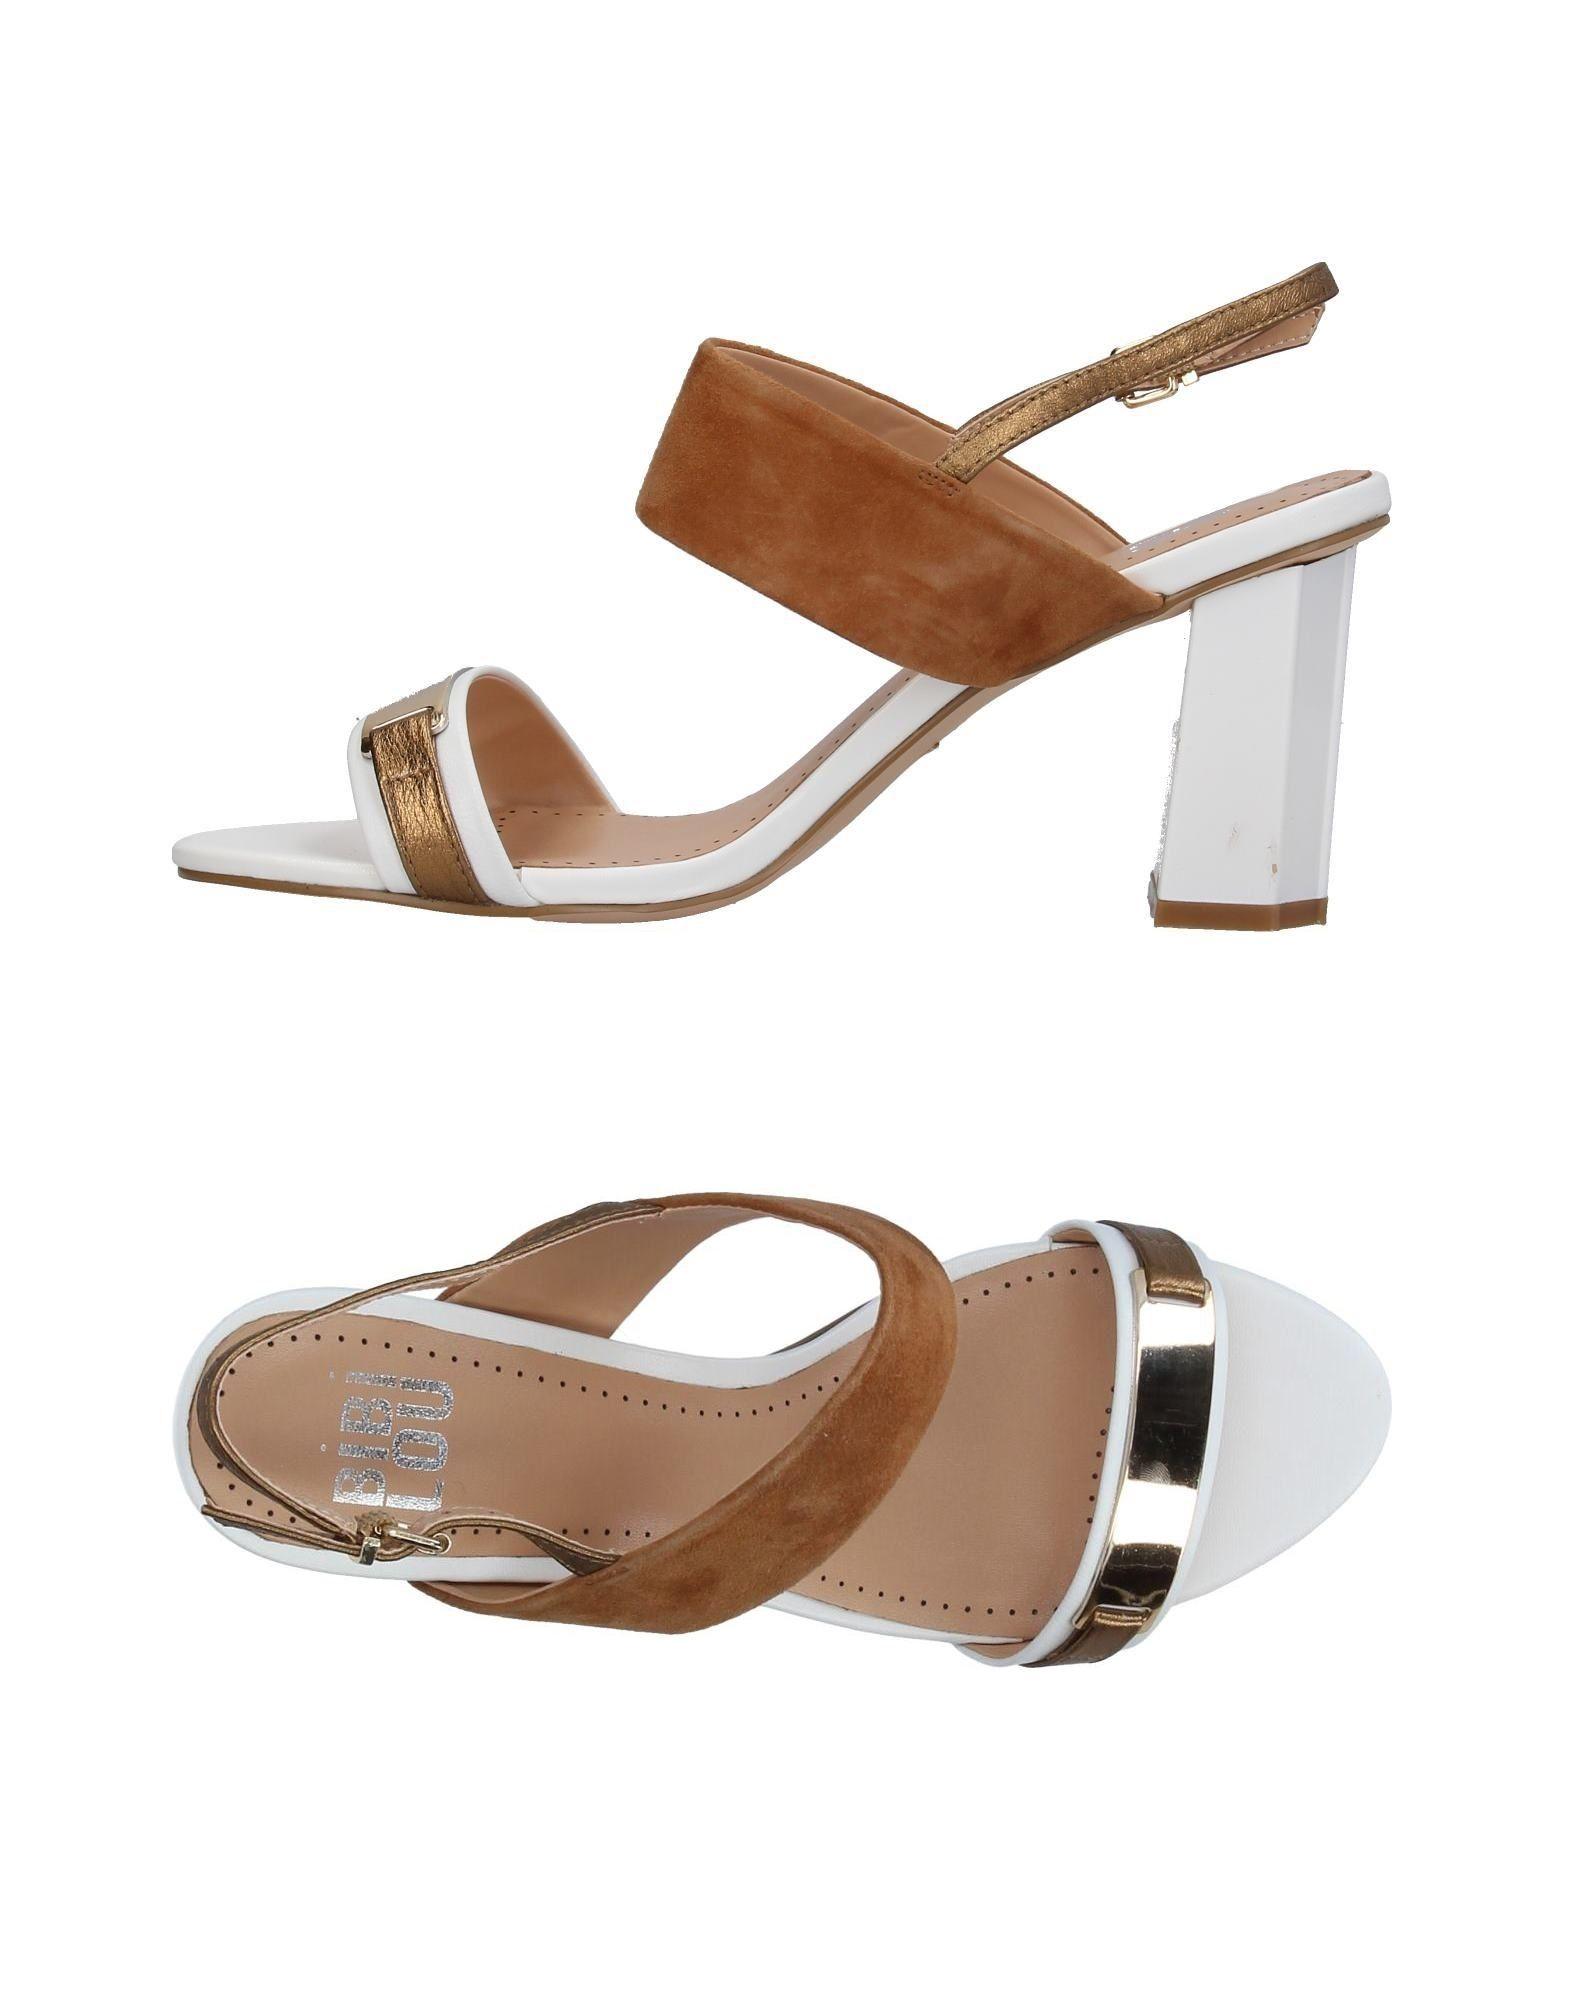 Chaussures - Sandales Post Orteils Dibrera Odx9x3qI